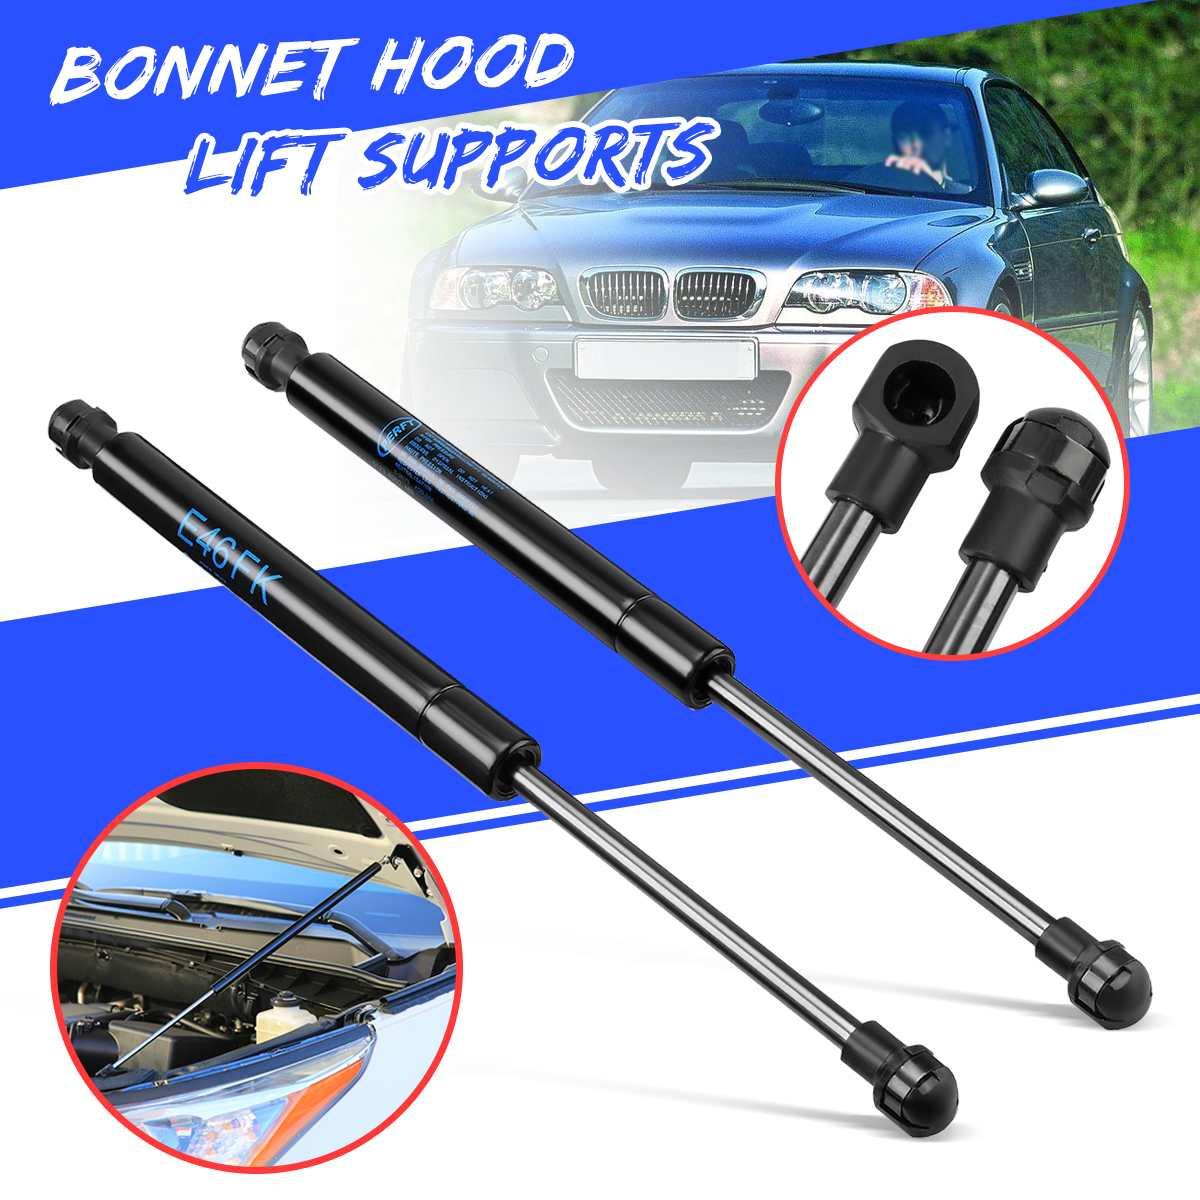 2 Trunk Lift Support Gas Strut Shock Springs Rod Fits BMW 325i 325xi 328i 328xi